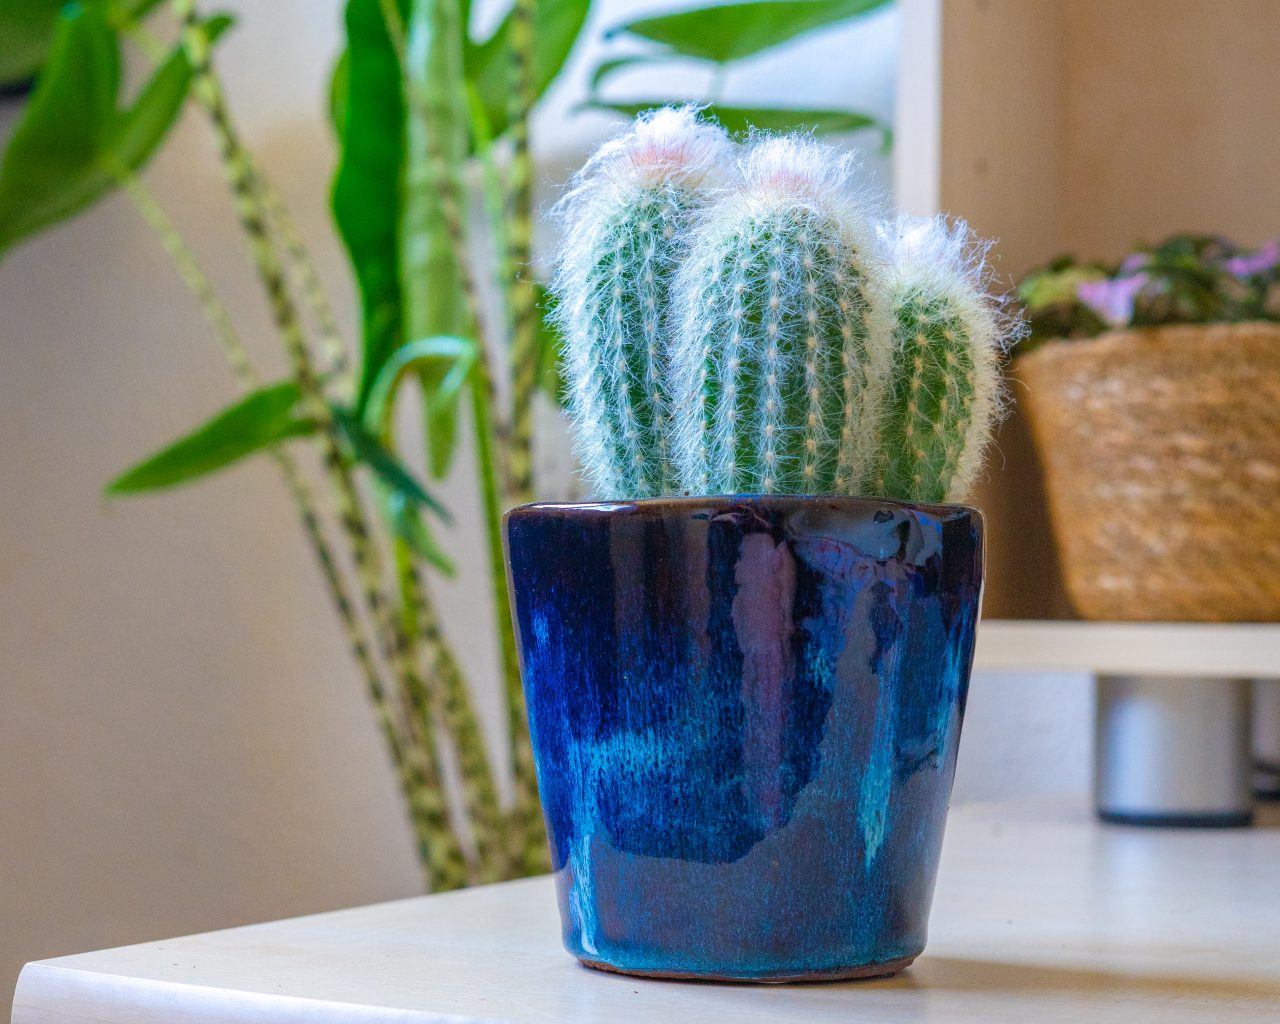 Cactus-makkelijke-kamerplant-weinig-water